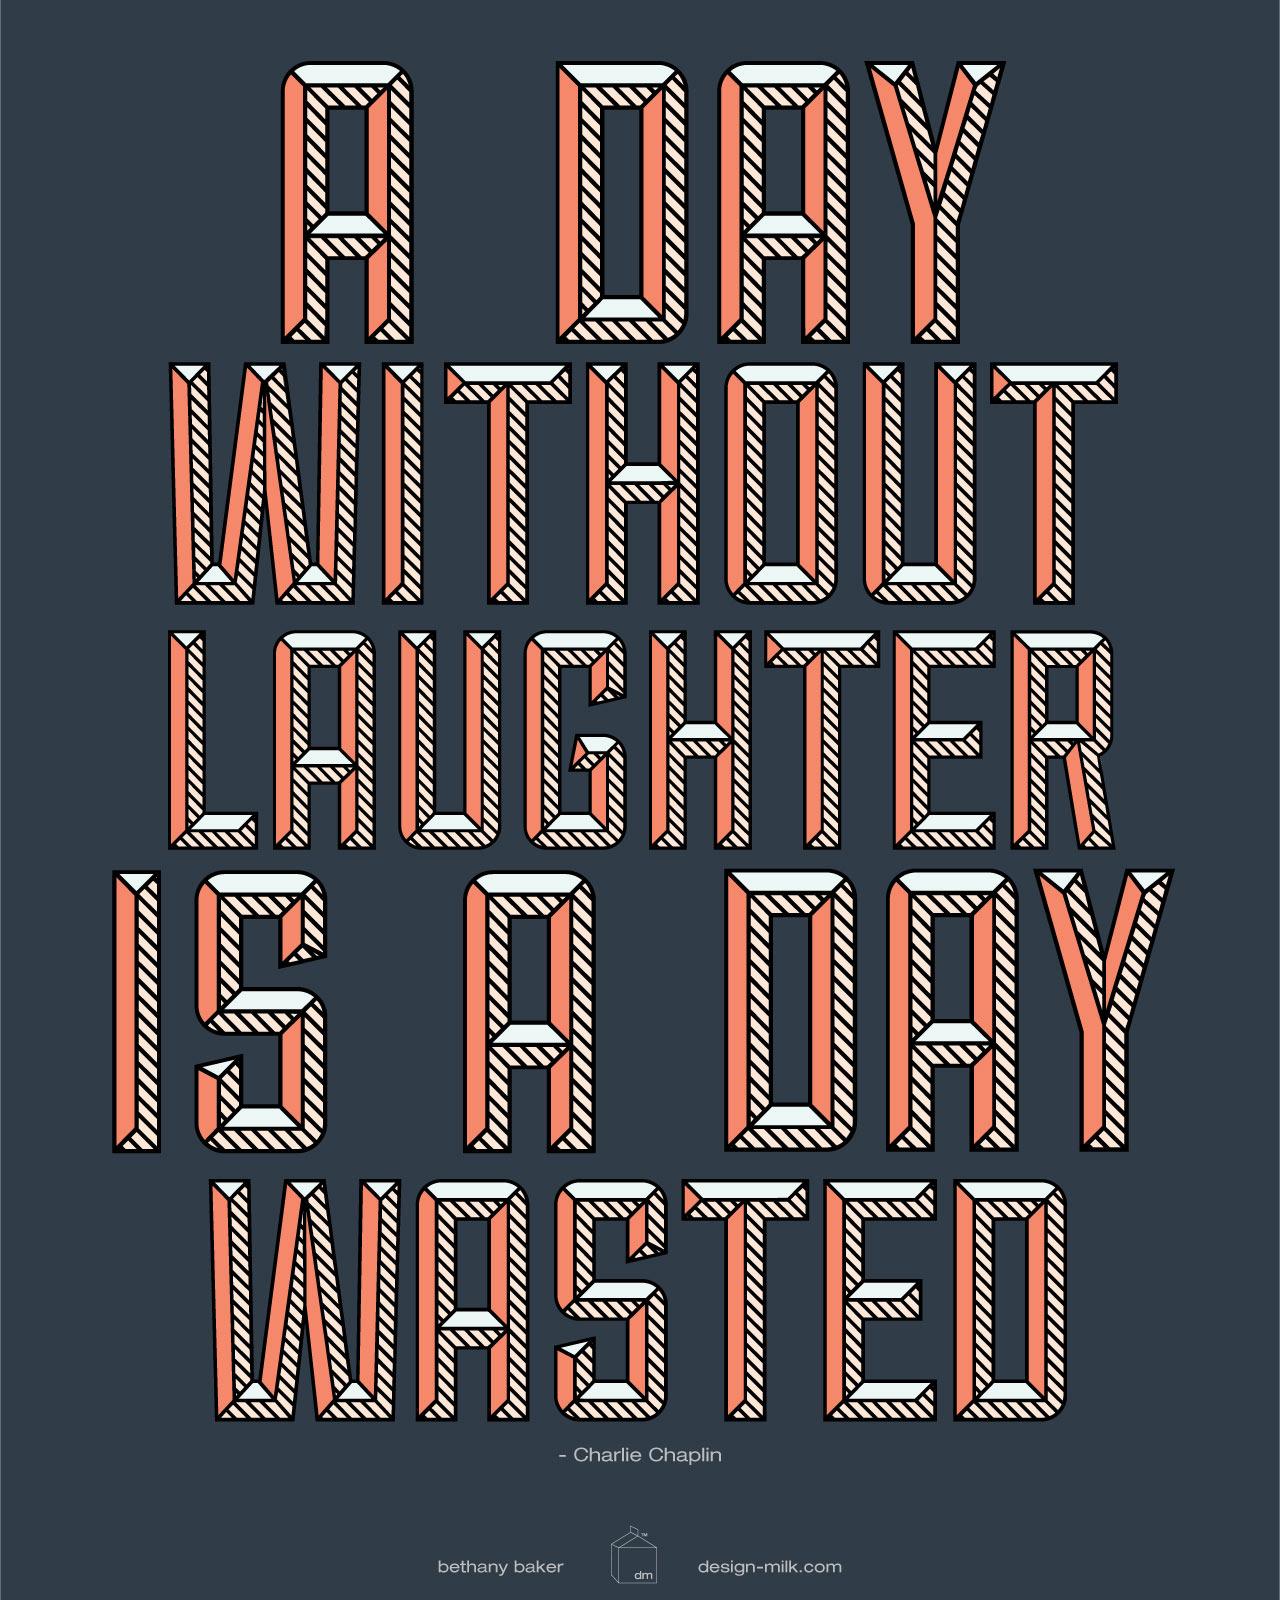 Vitamin D: Laughter